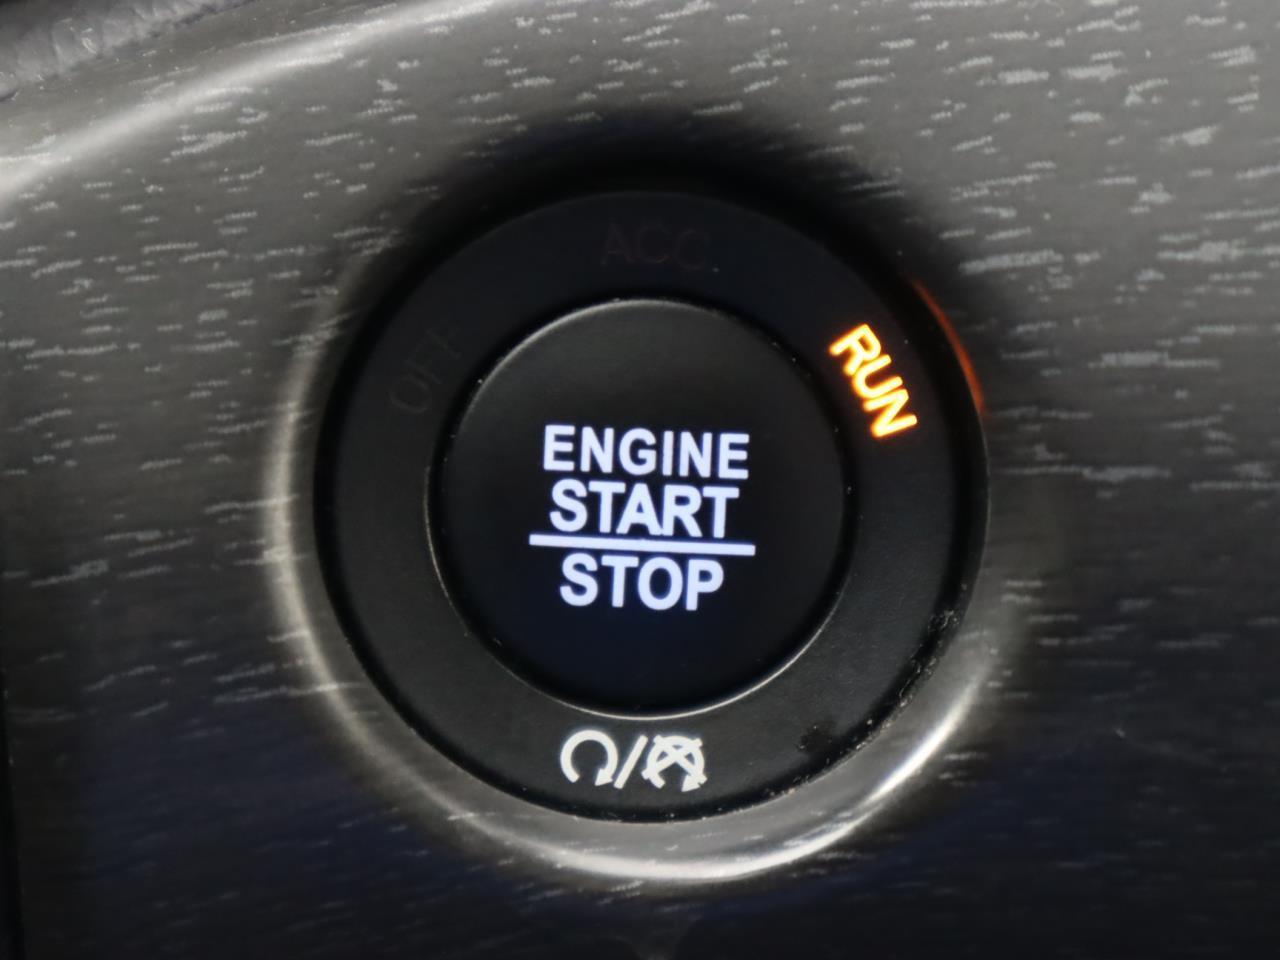 used vehicle - SUV JEEP GRAND CHEROKEE 2017